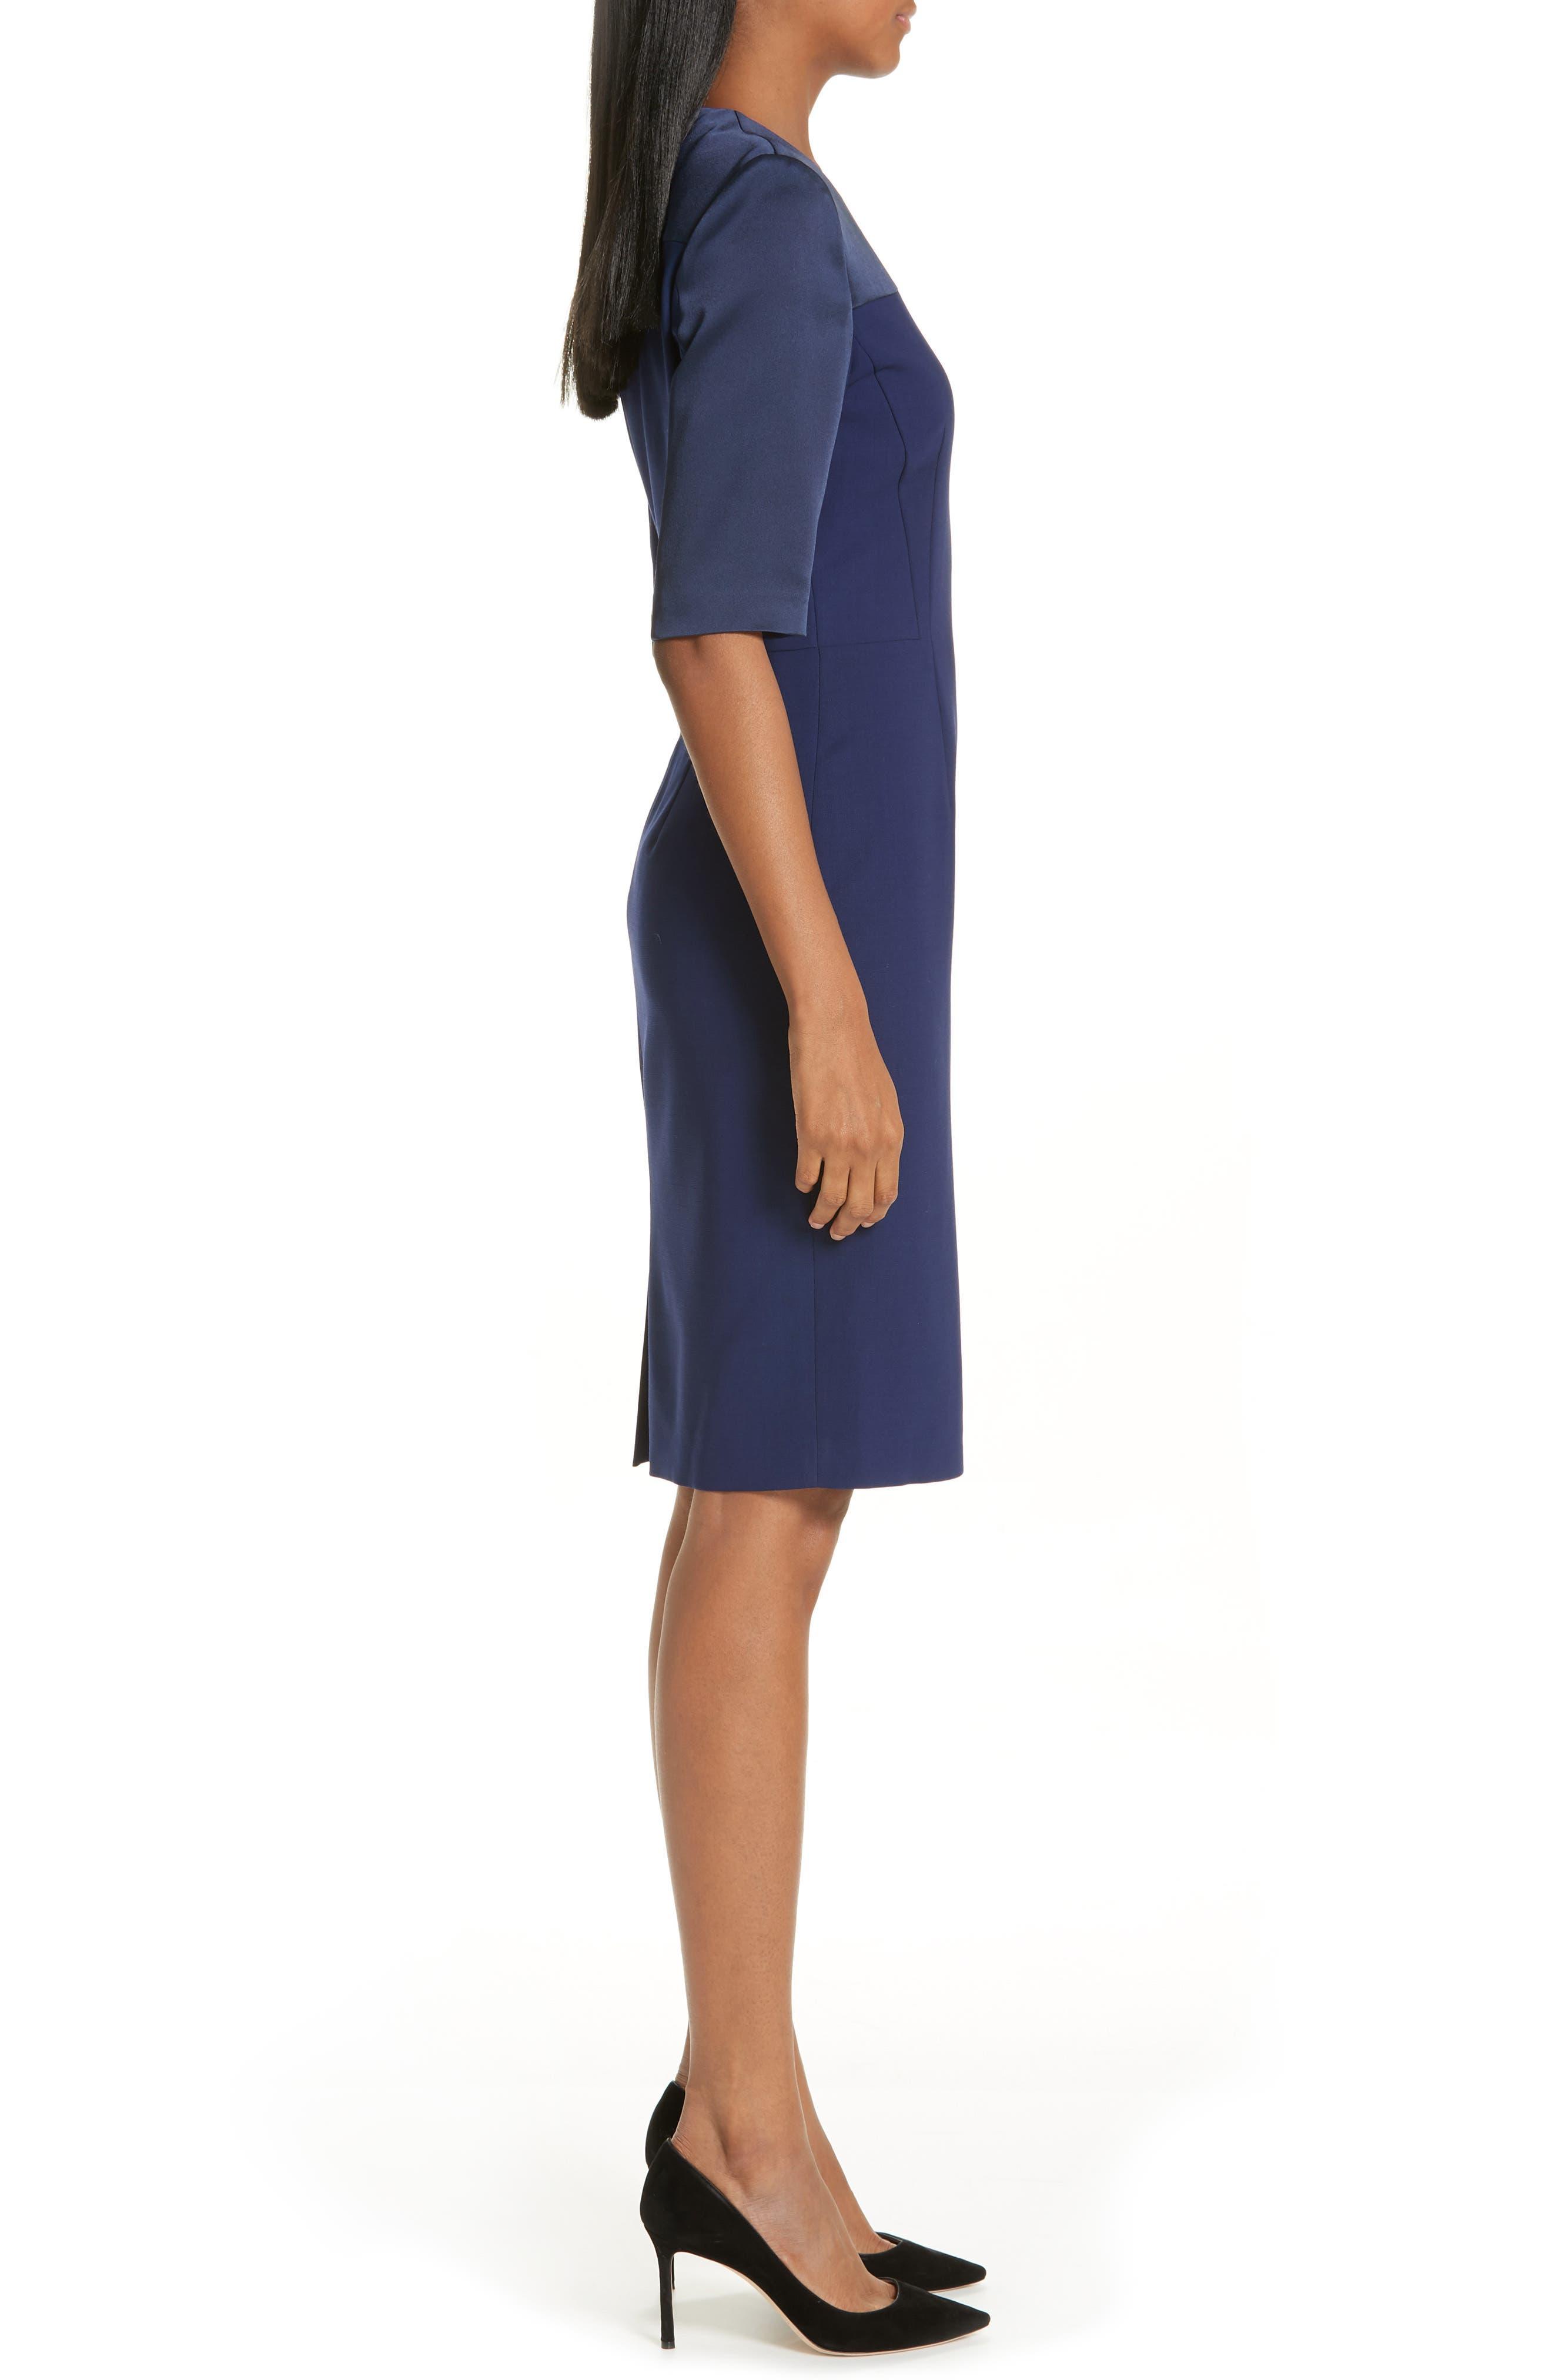 Danufa Stretch Wool Sheath Dress,                             Alternate thumbnail 3, color,                             INK BLUE